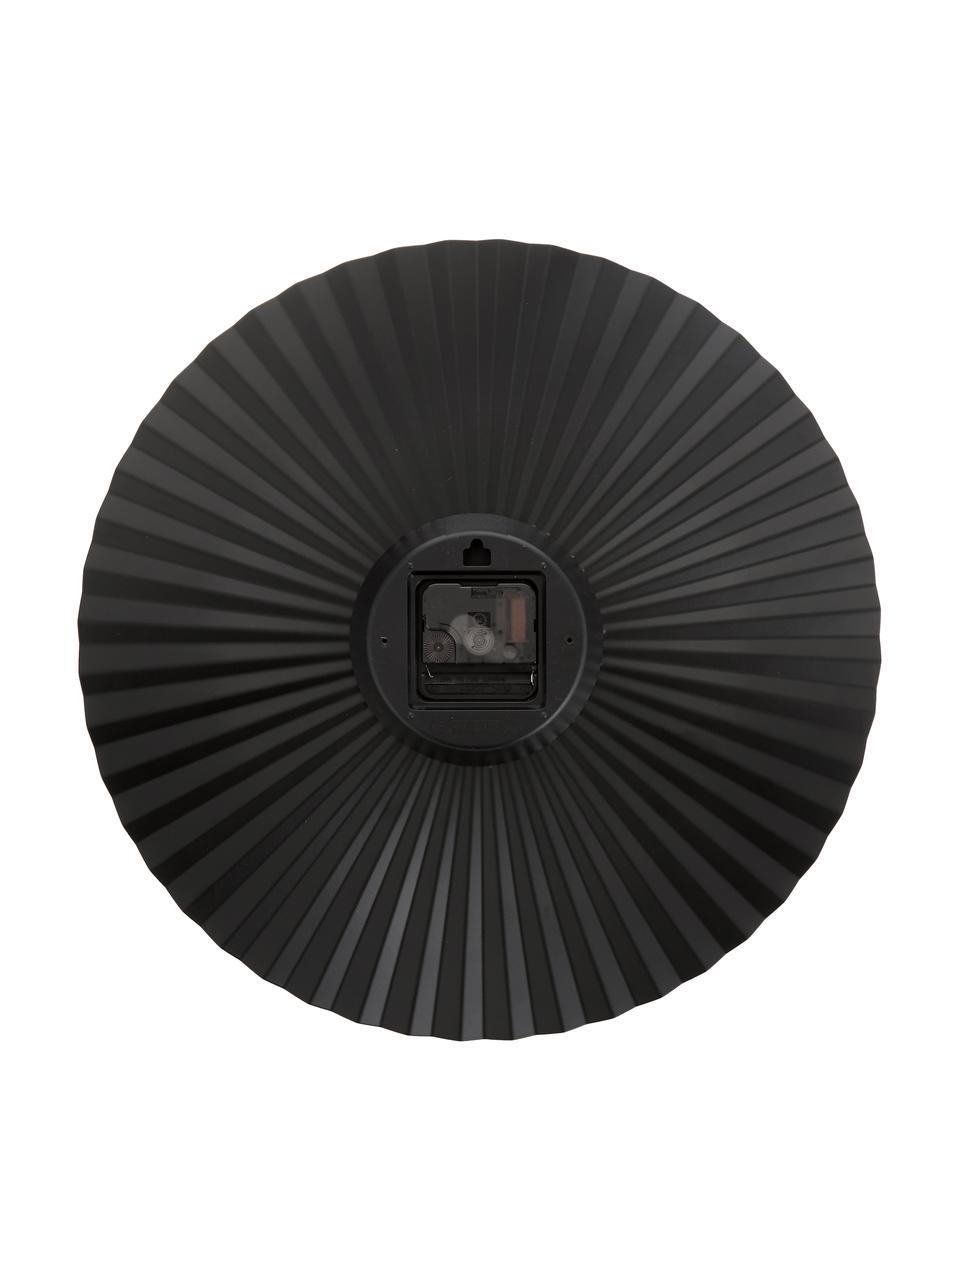 Wanduhr Sensu, Ziffernblatt: Stahl, lackiert, Zeiger: Metall, Schwarz, Ø 40 cm